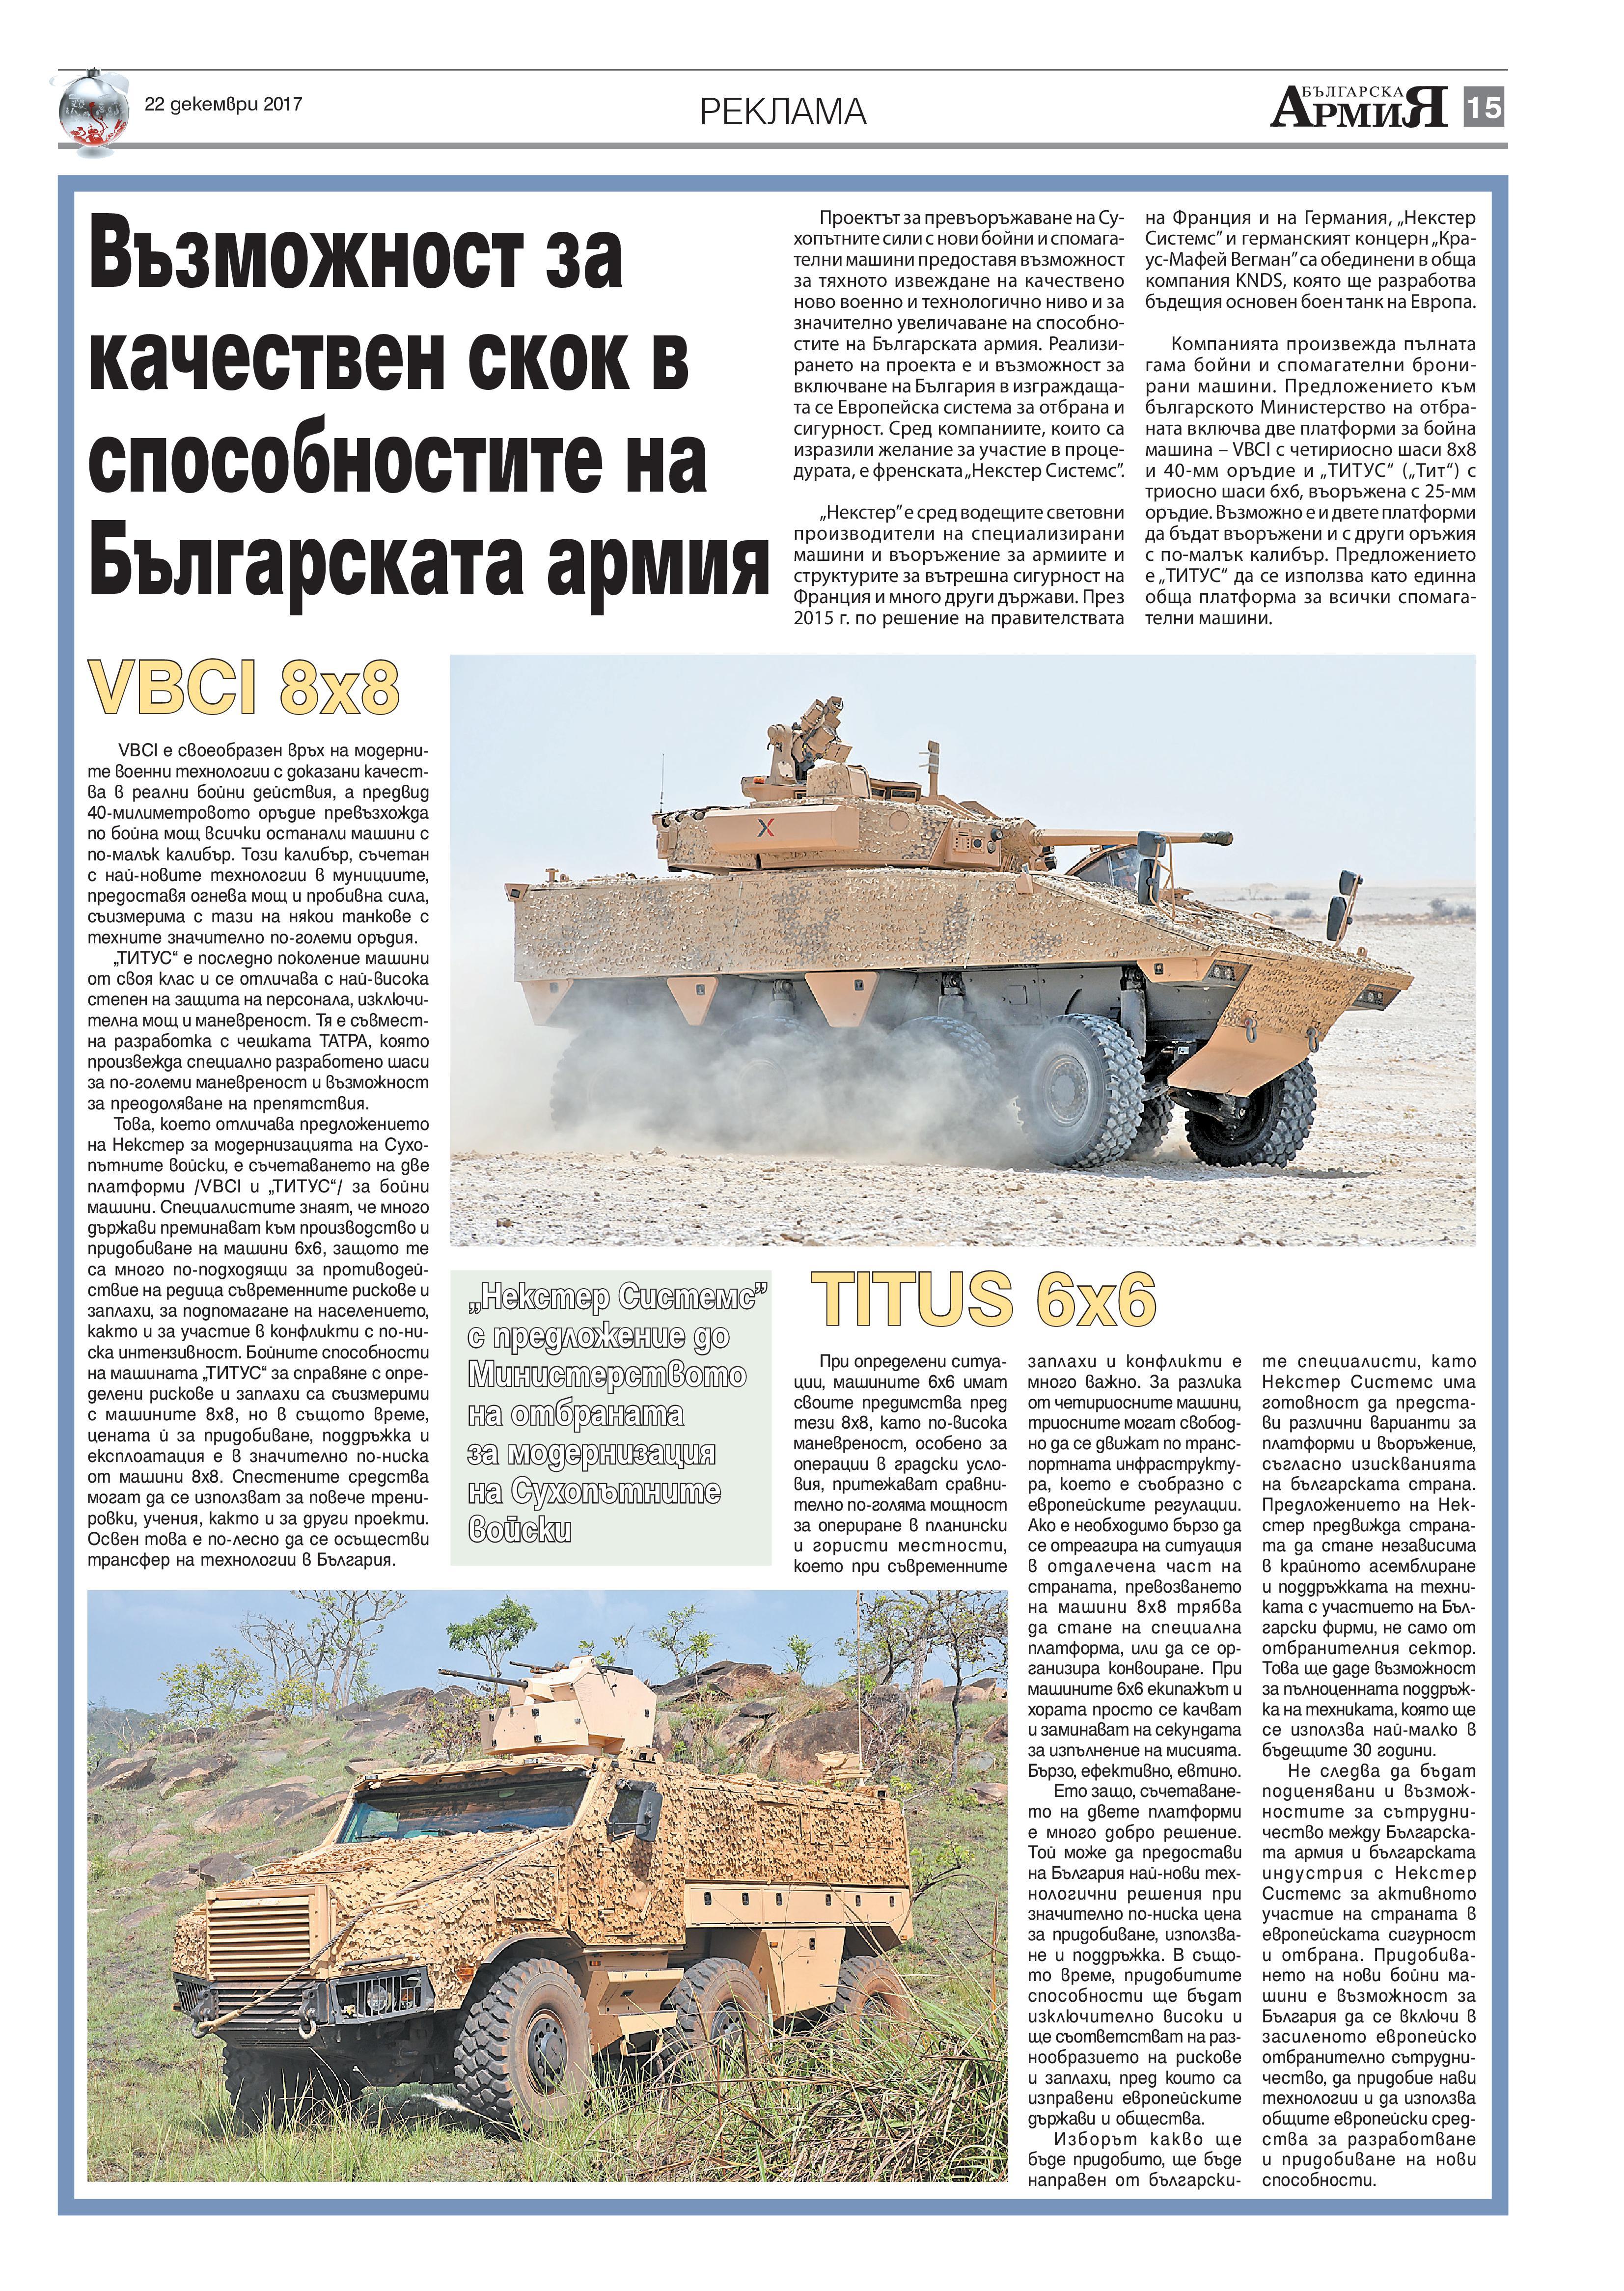 http://armymedia.bg/wp-content/uploads/2015/06/15-16.jpg